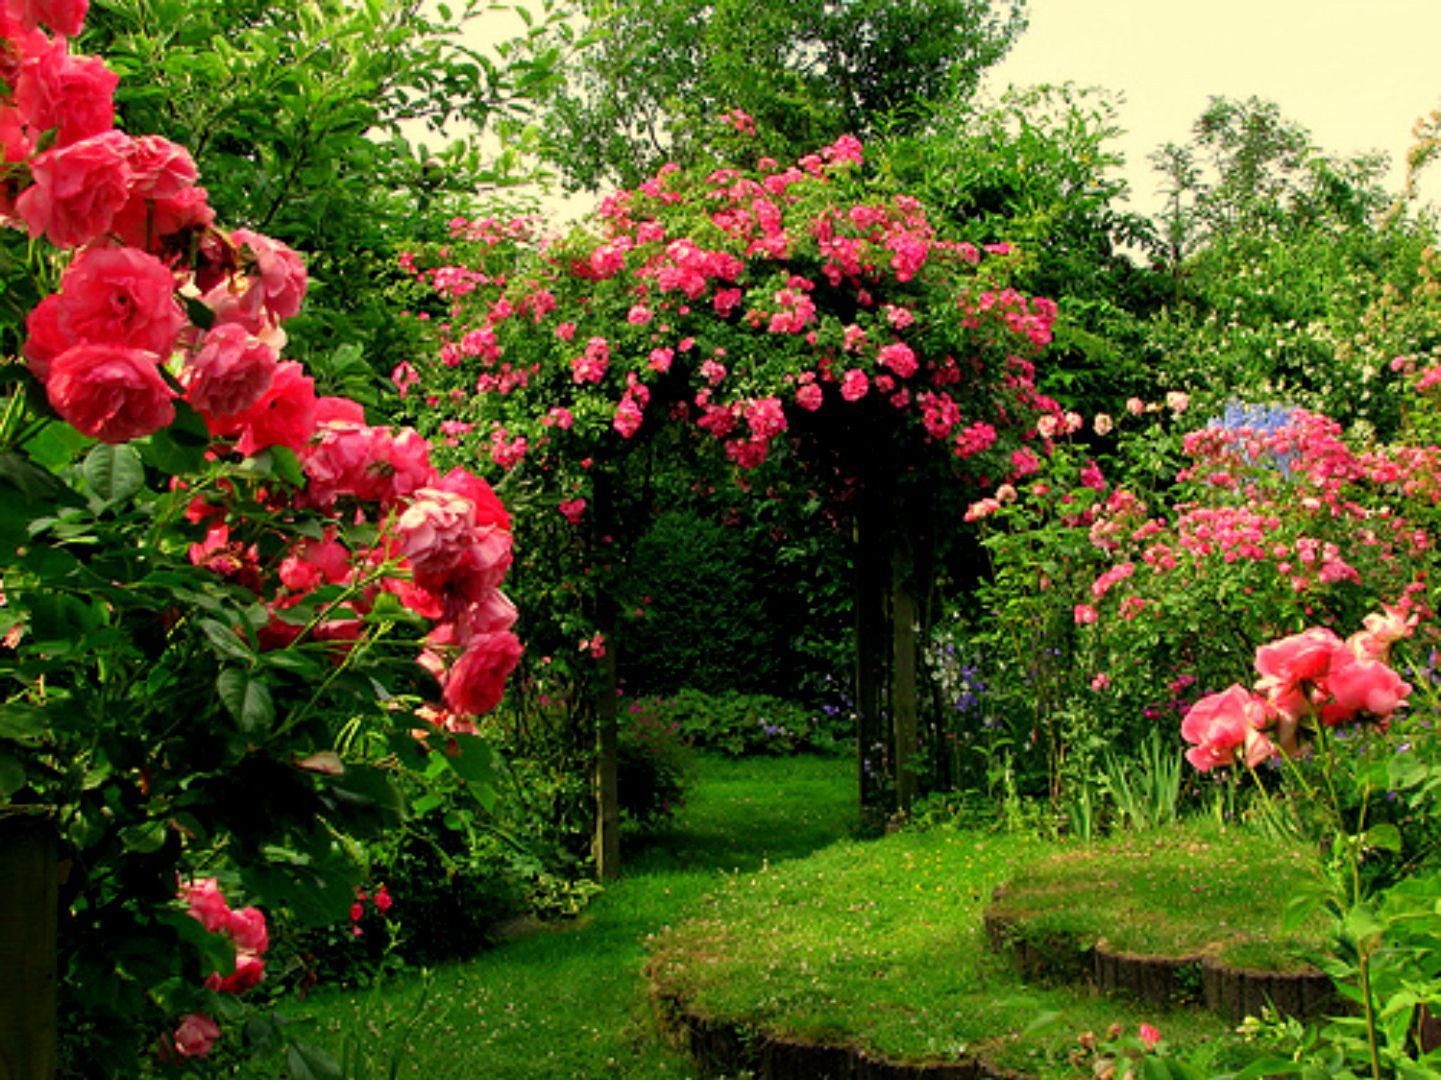 Garage , Nice Rose Flowers In Beautiful Garden Pictures ...